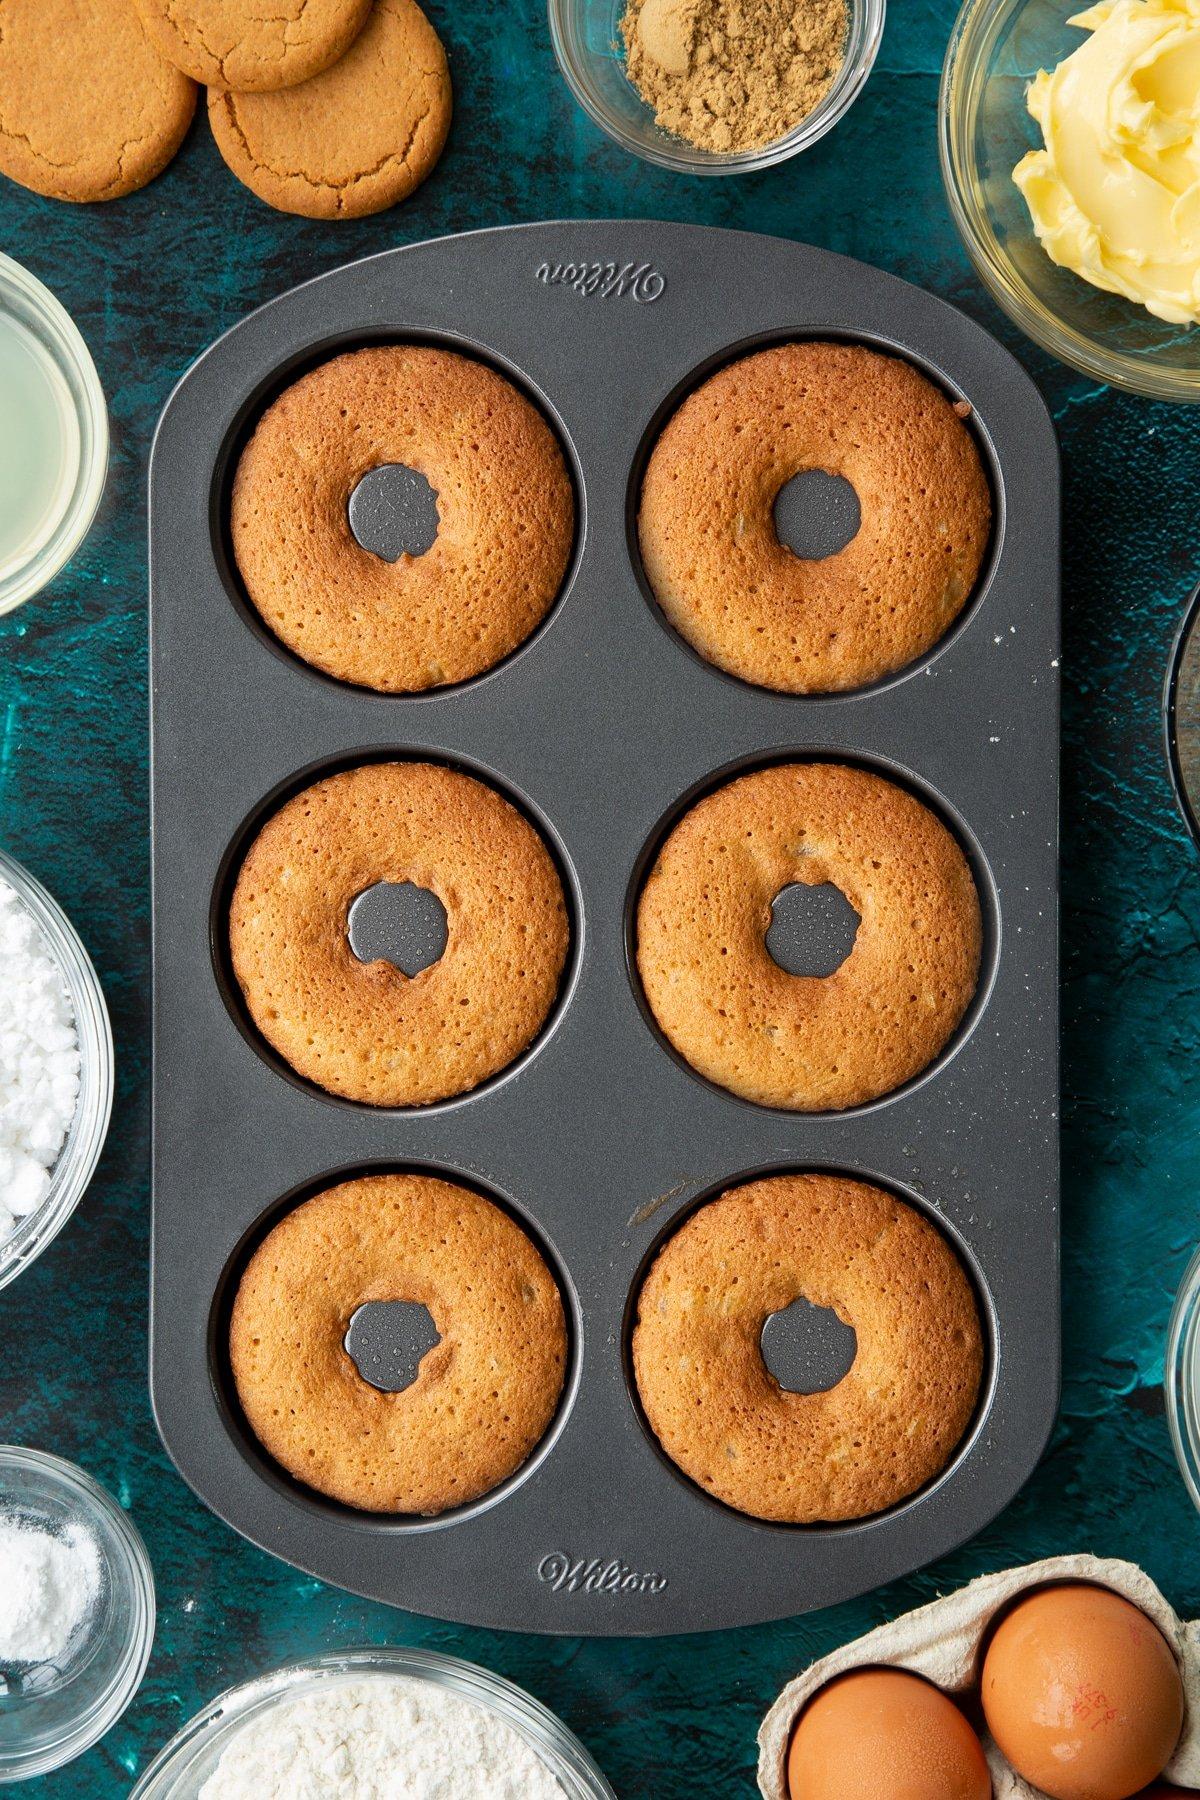 Freshly baked gingerbread donuts in a metal donut pan.